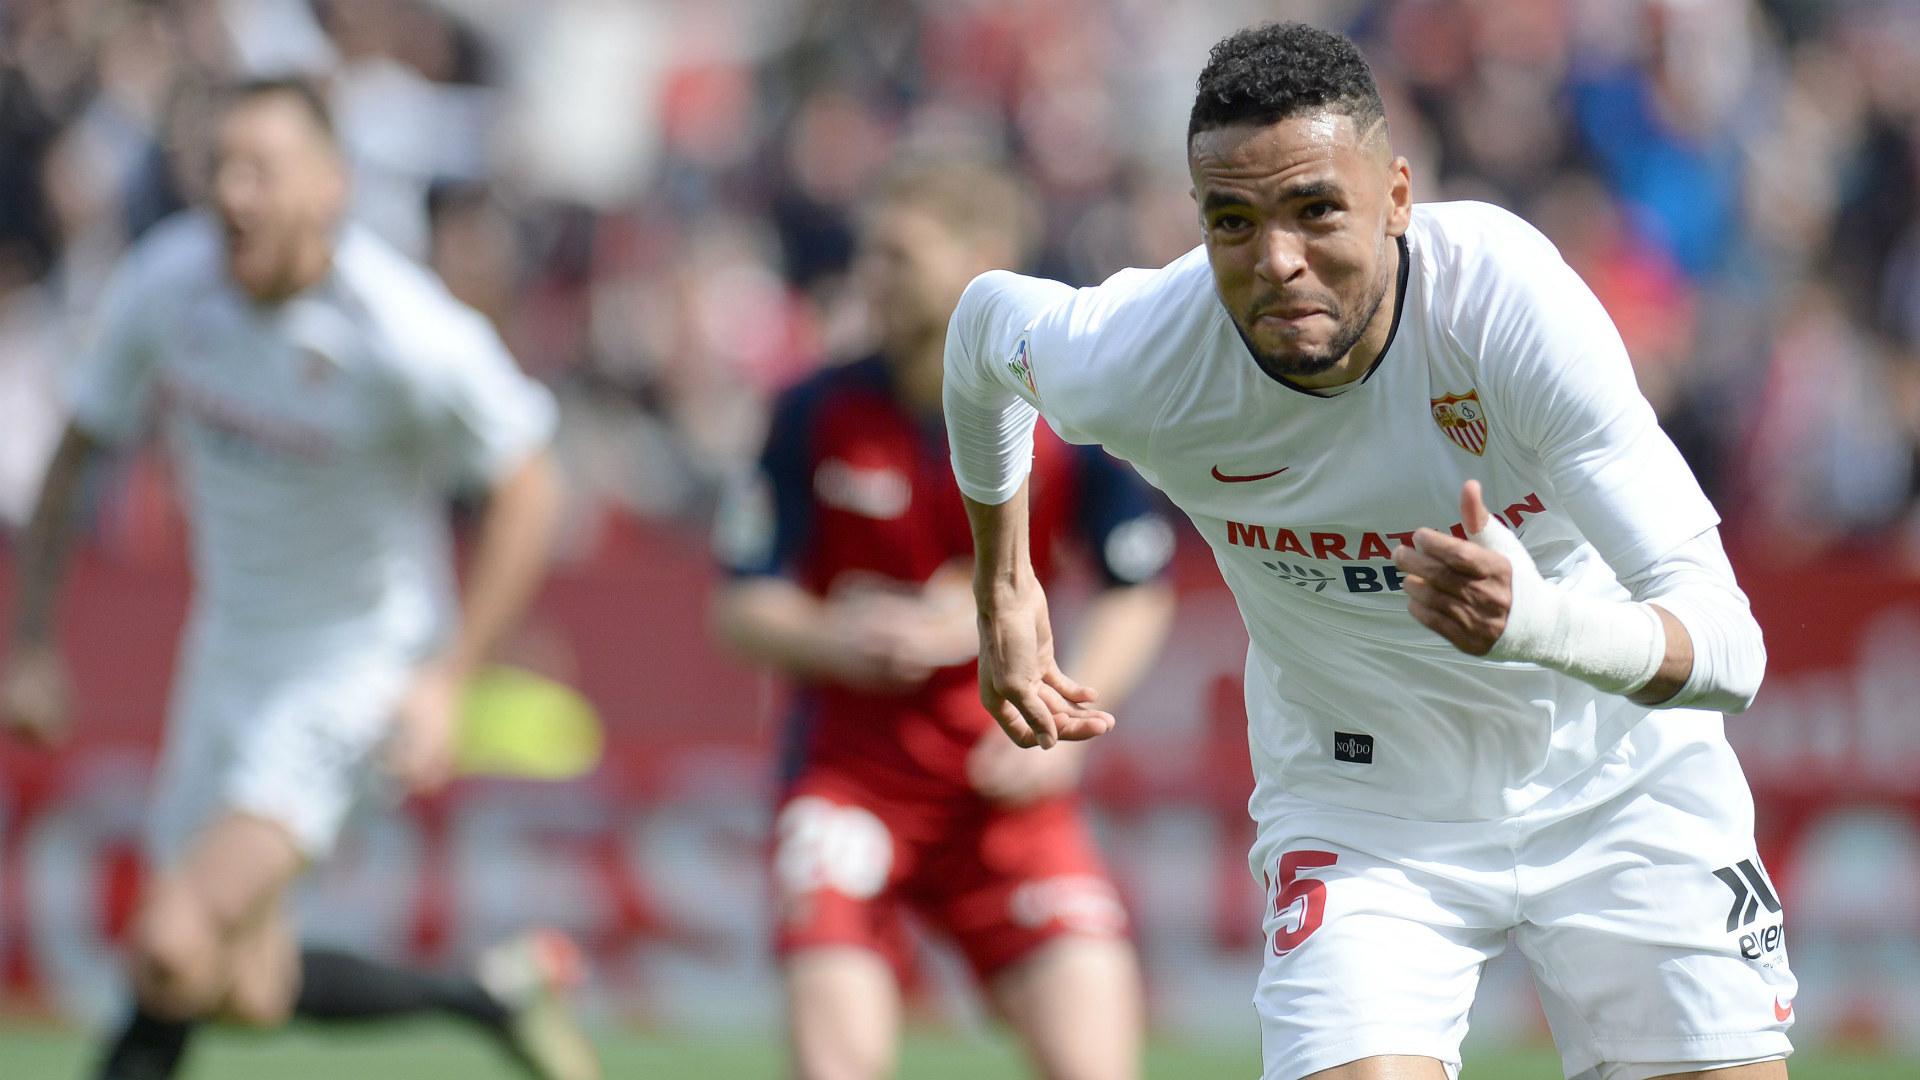 Sevilla's En-Nesyri can challenge Messi and Suarez for Pichichi trophy